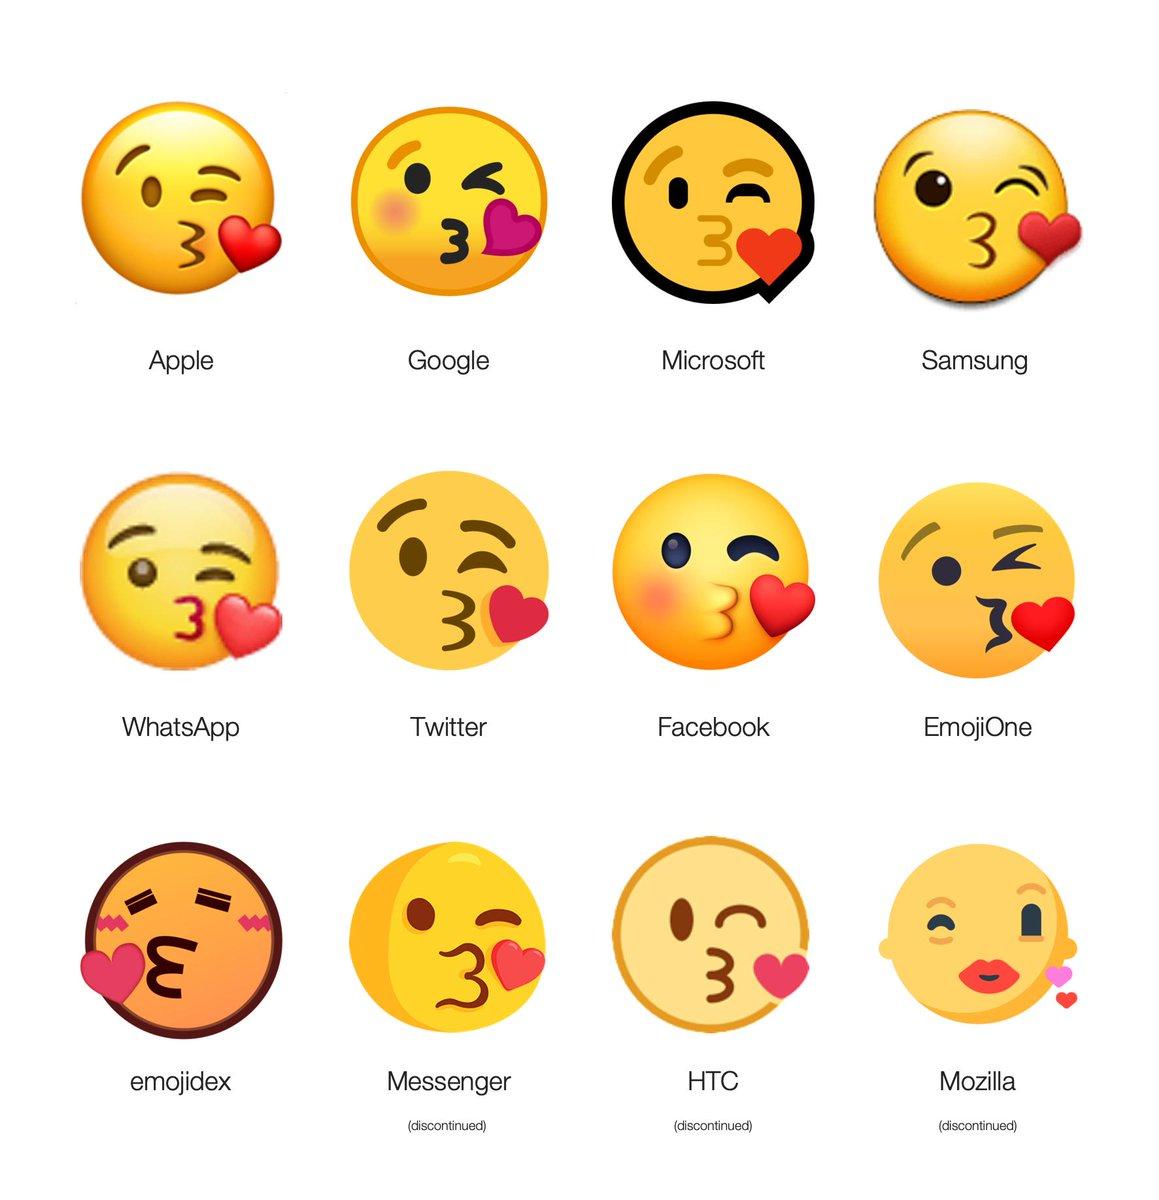 Emojipedia On Twitter Httpstcoqixdhvow13 The Mozilla